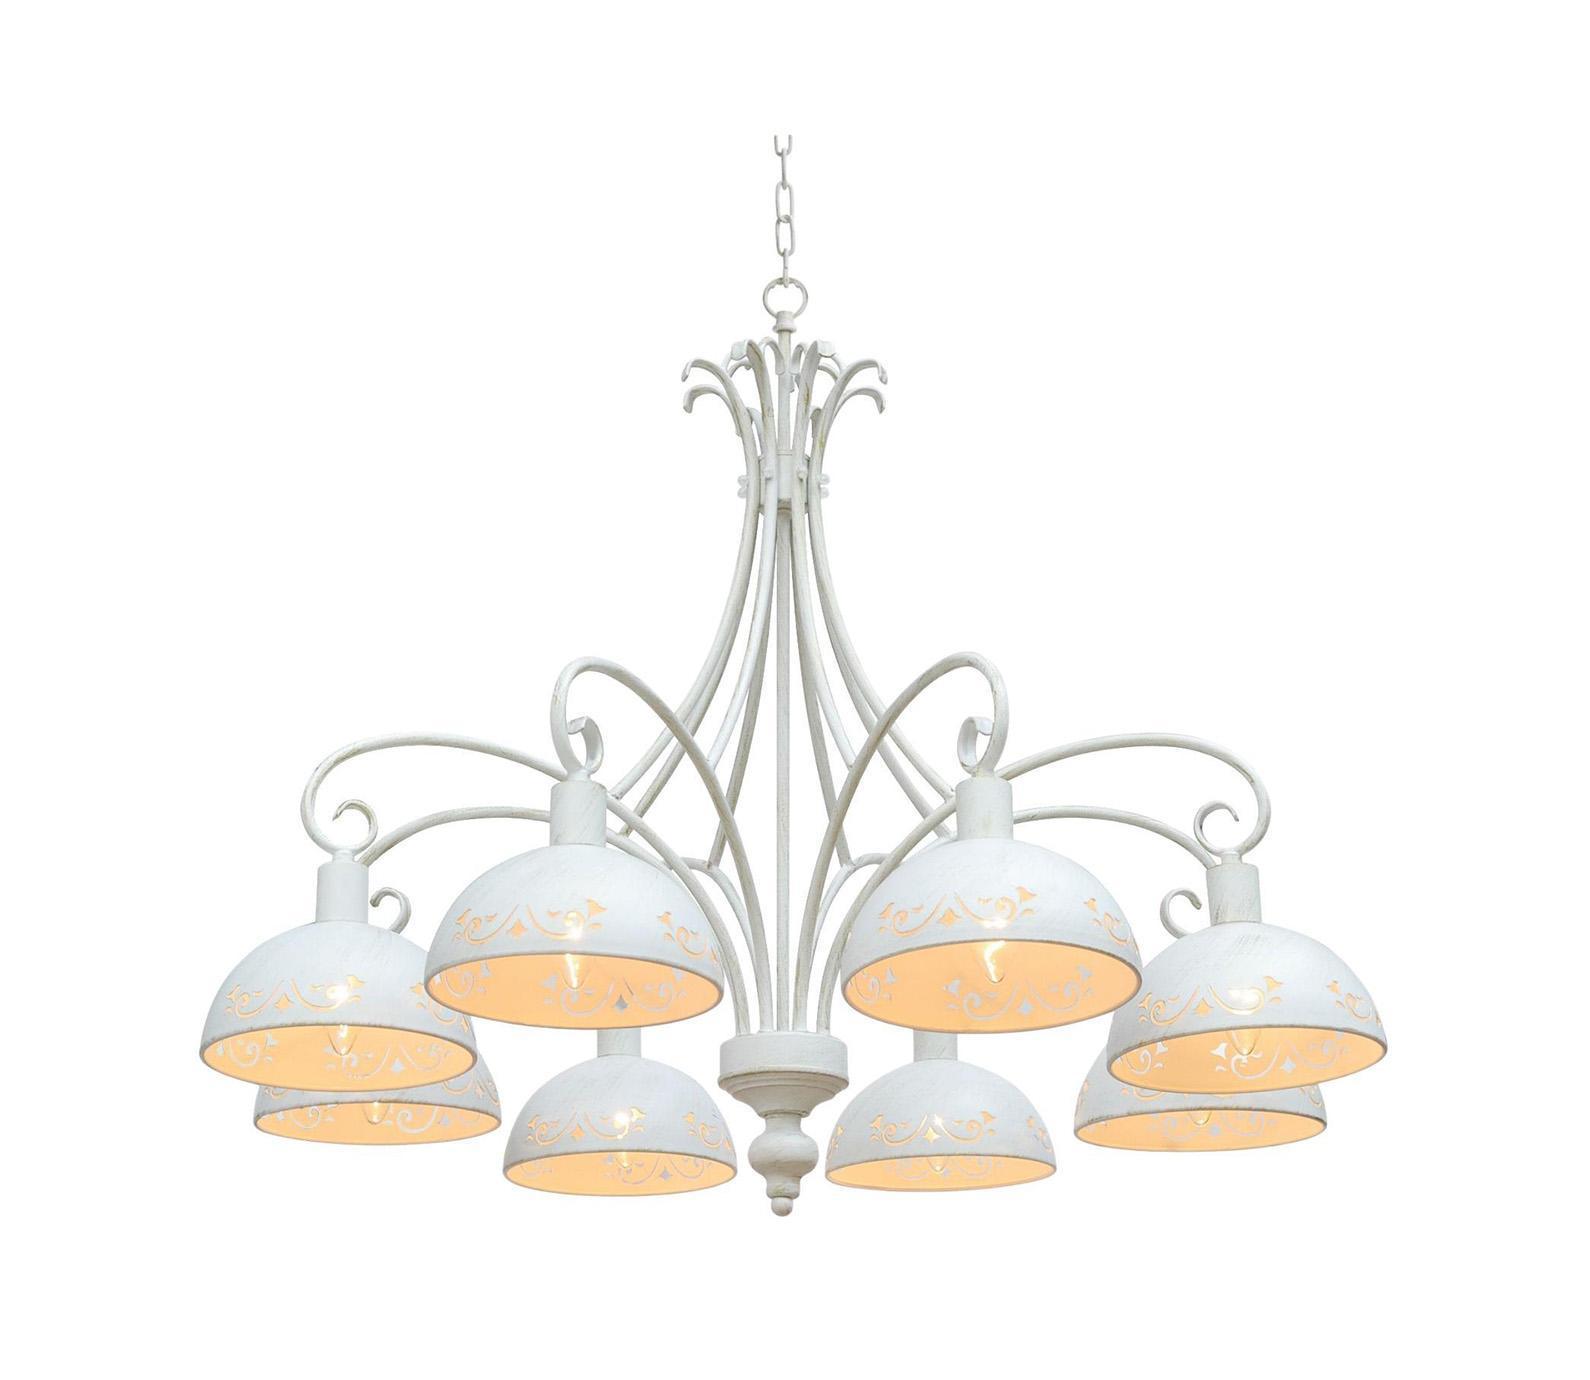 Arte Lamp A2060LM-8WG PITTORE Люста на цепи